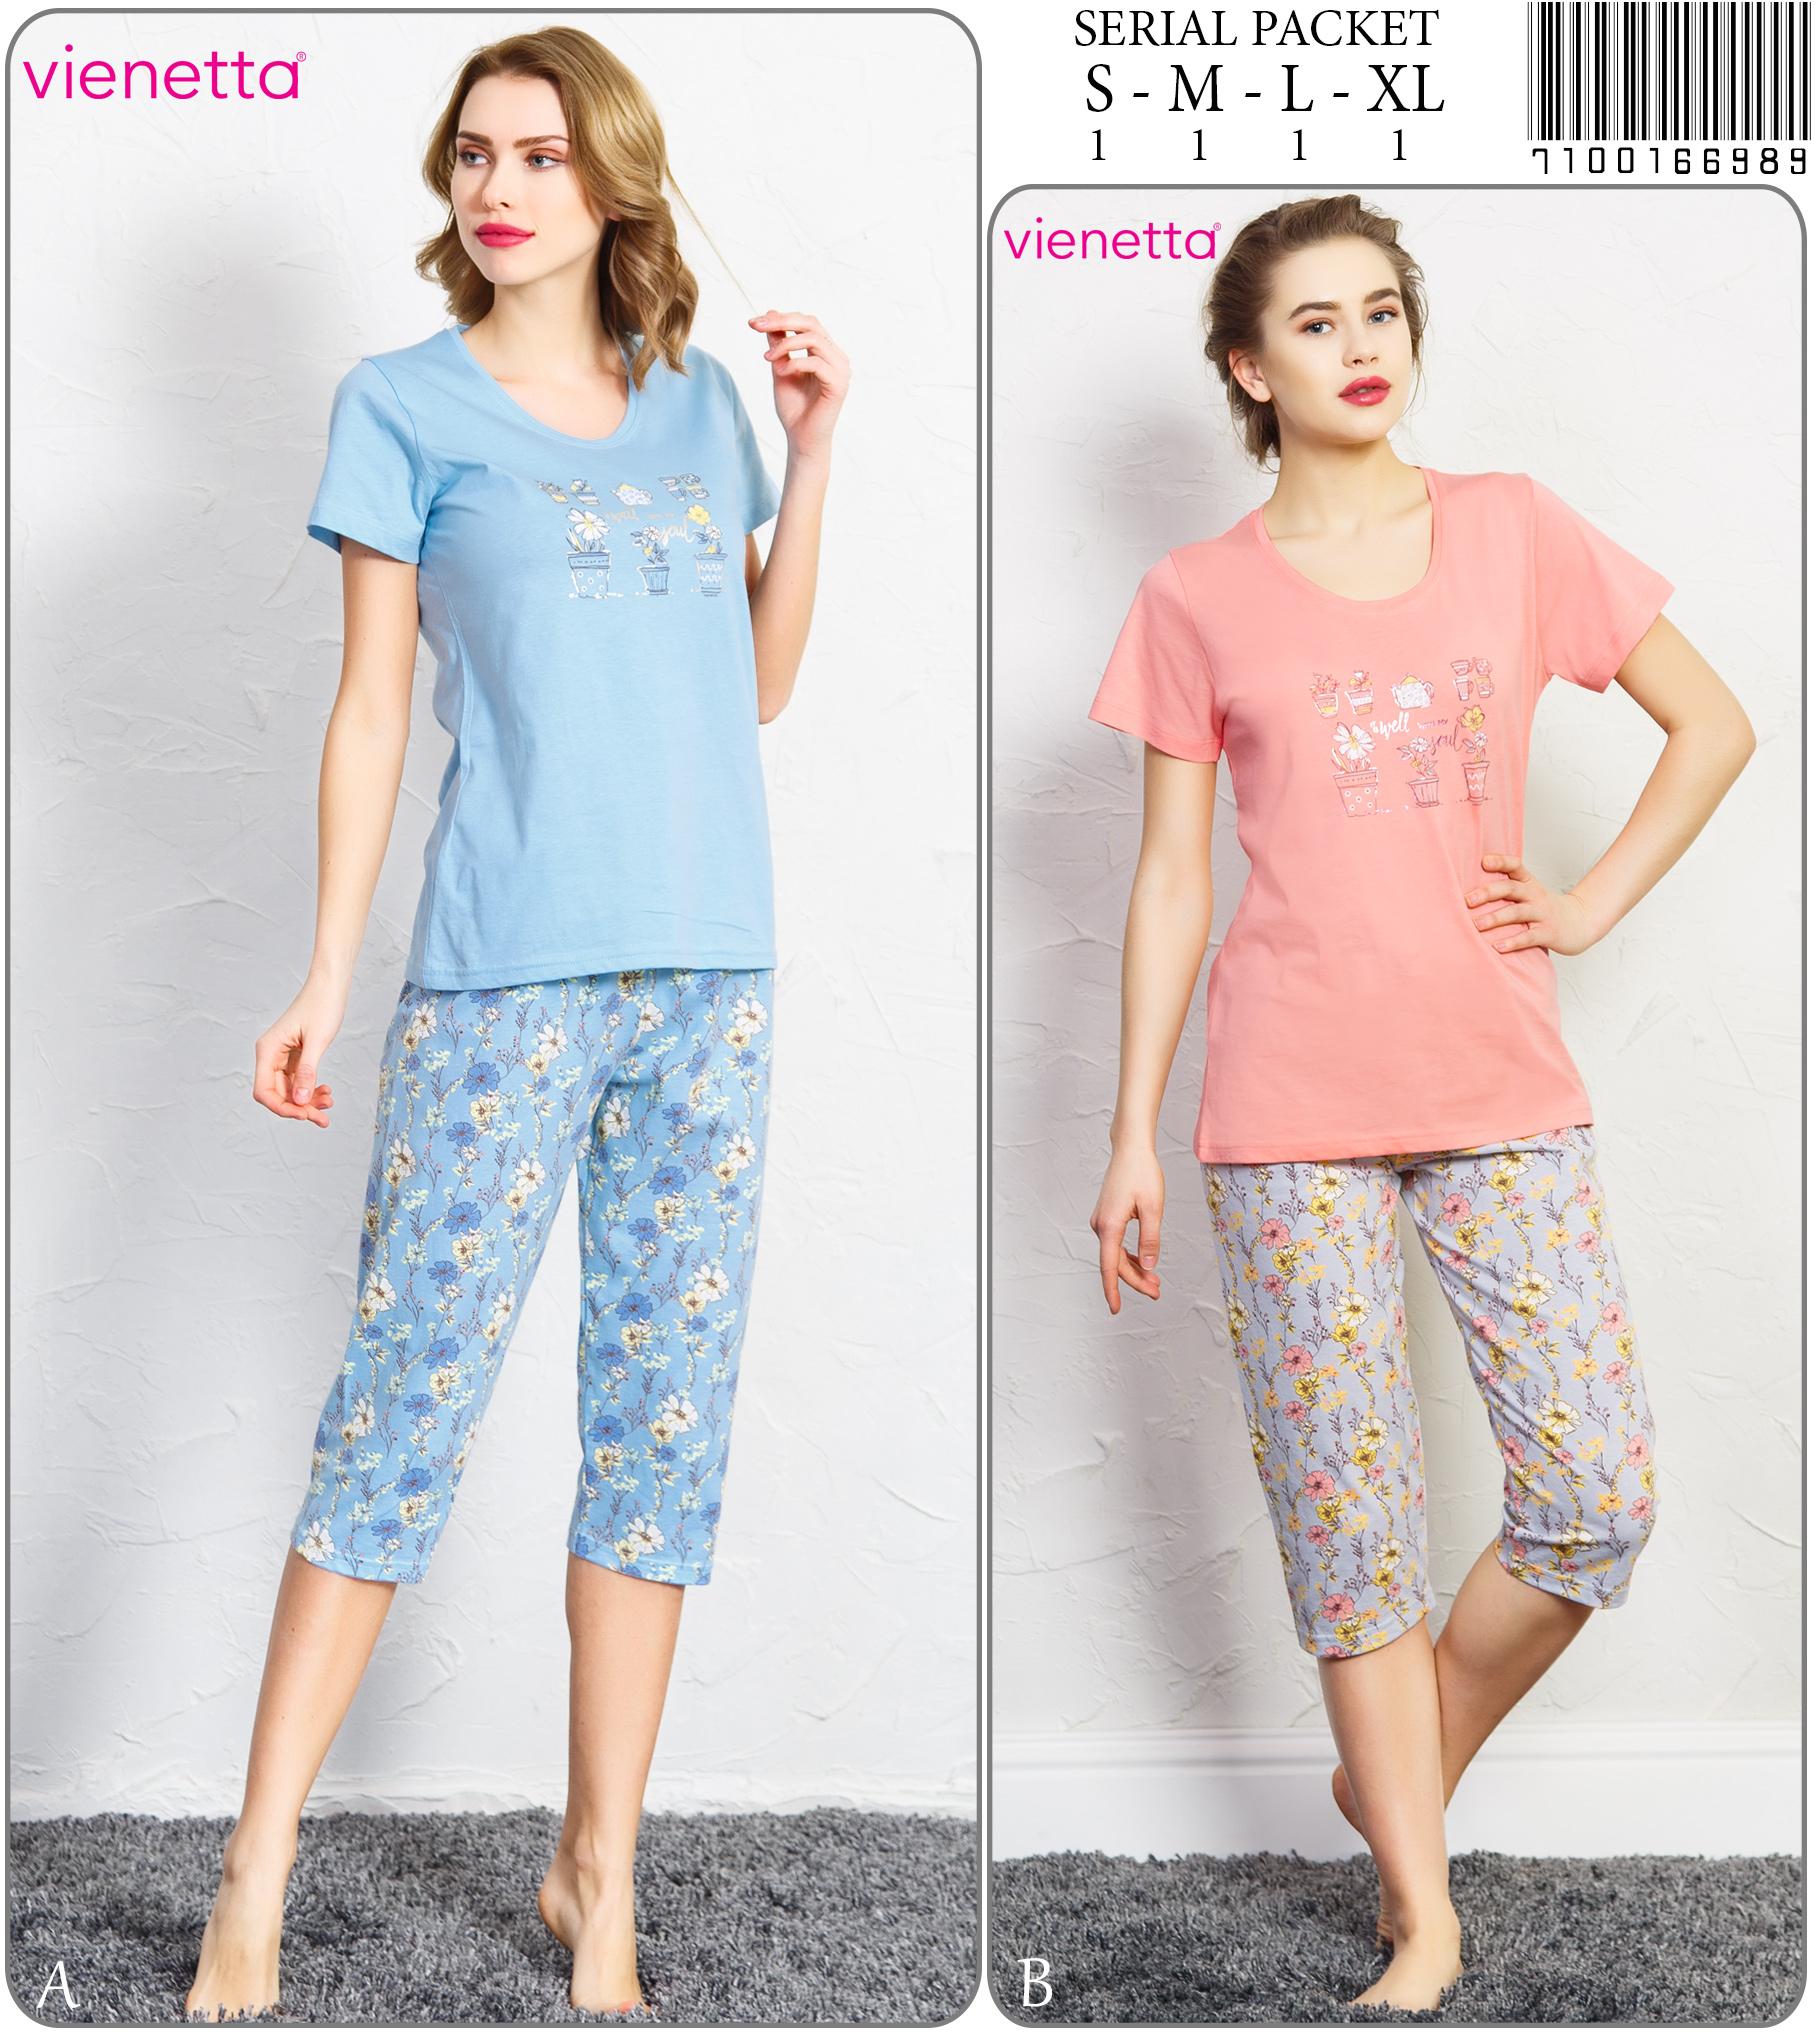 Пижама женская Капри 7100166989